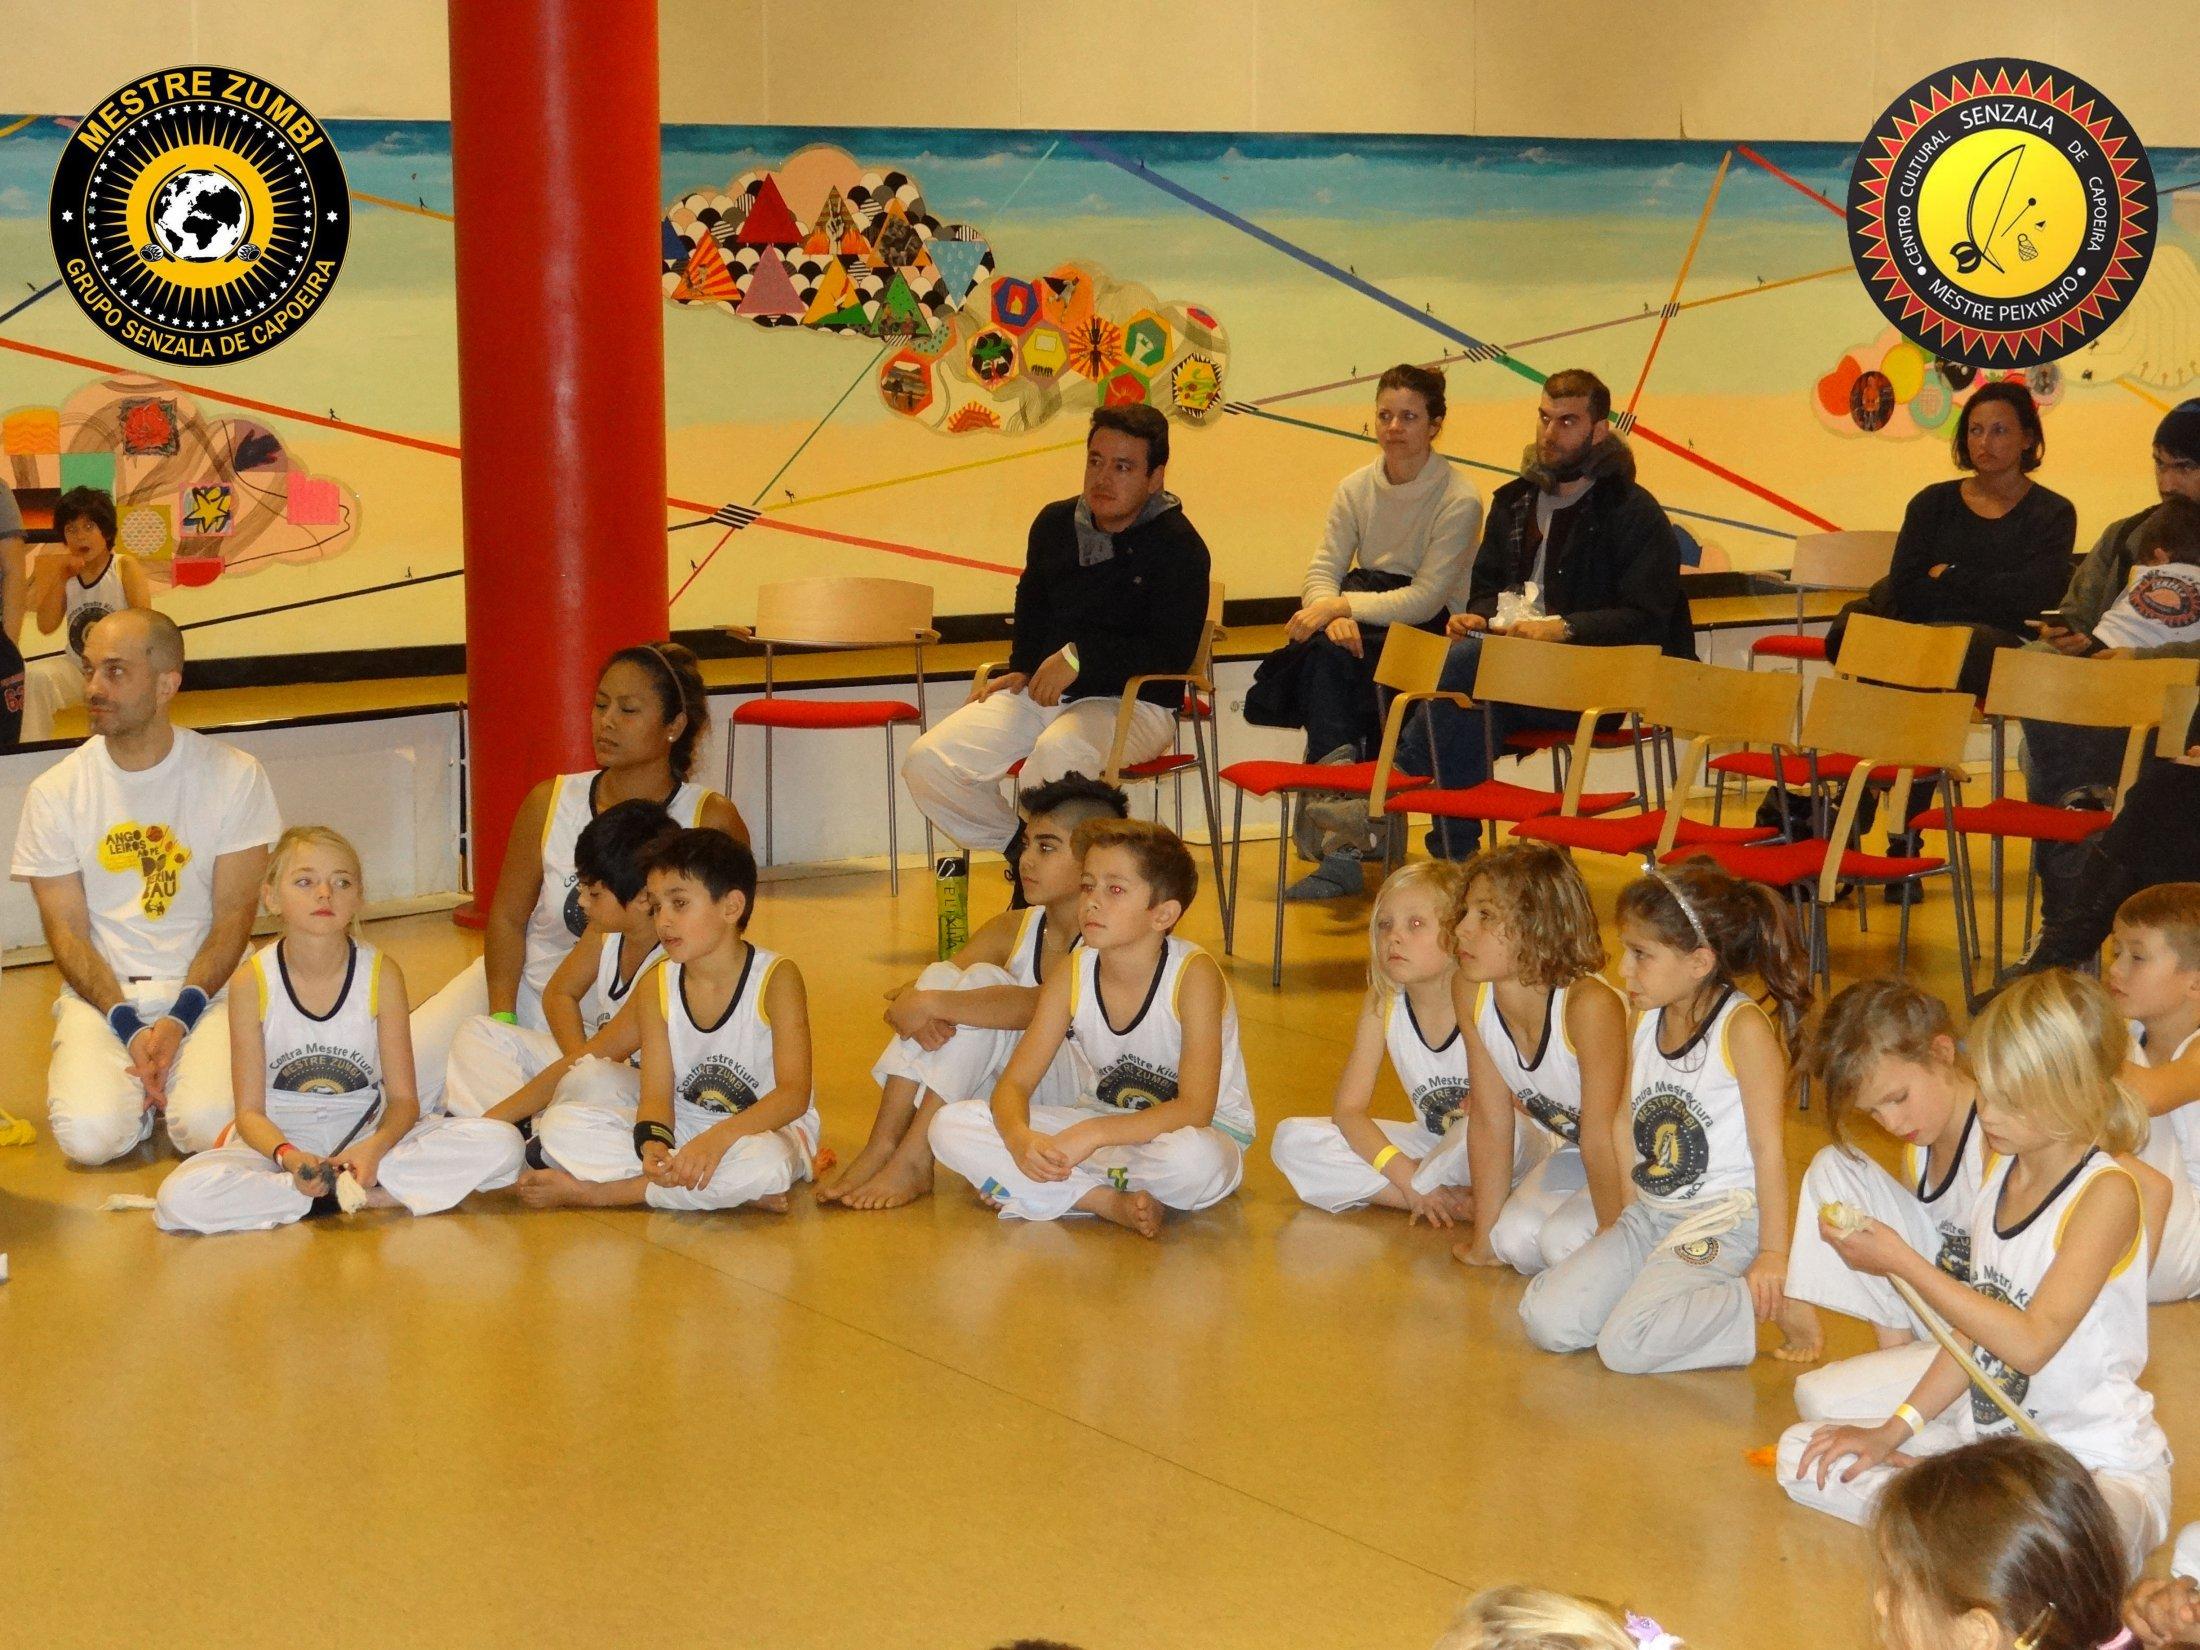 2013-12-14 - Capoeira 086